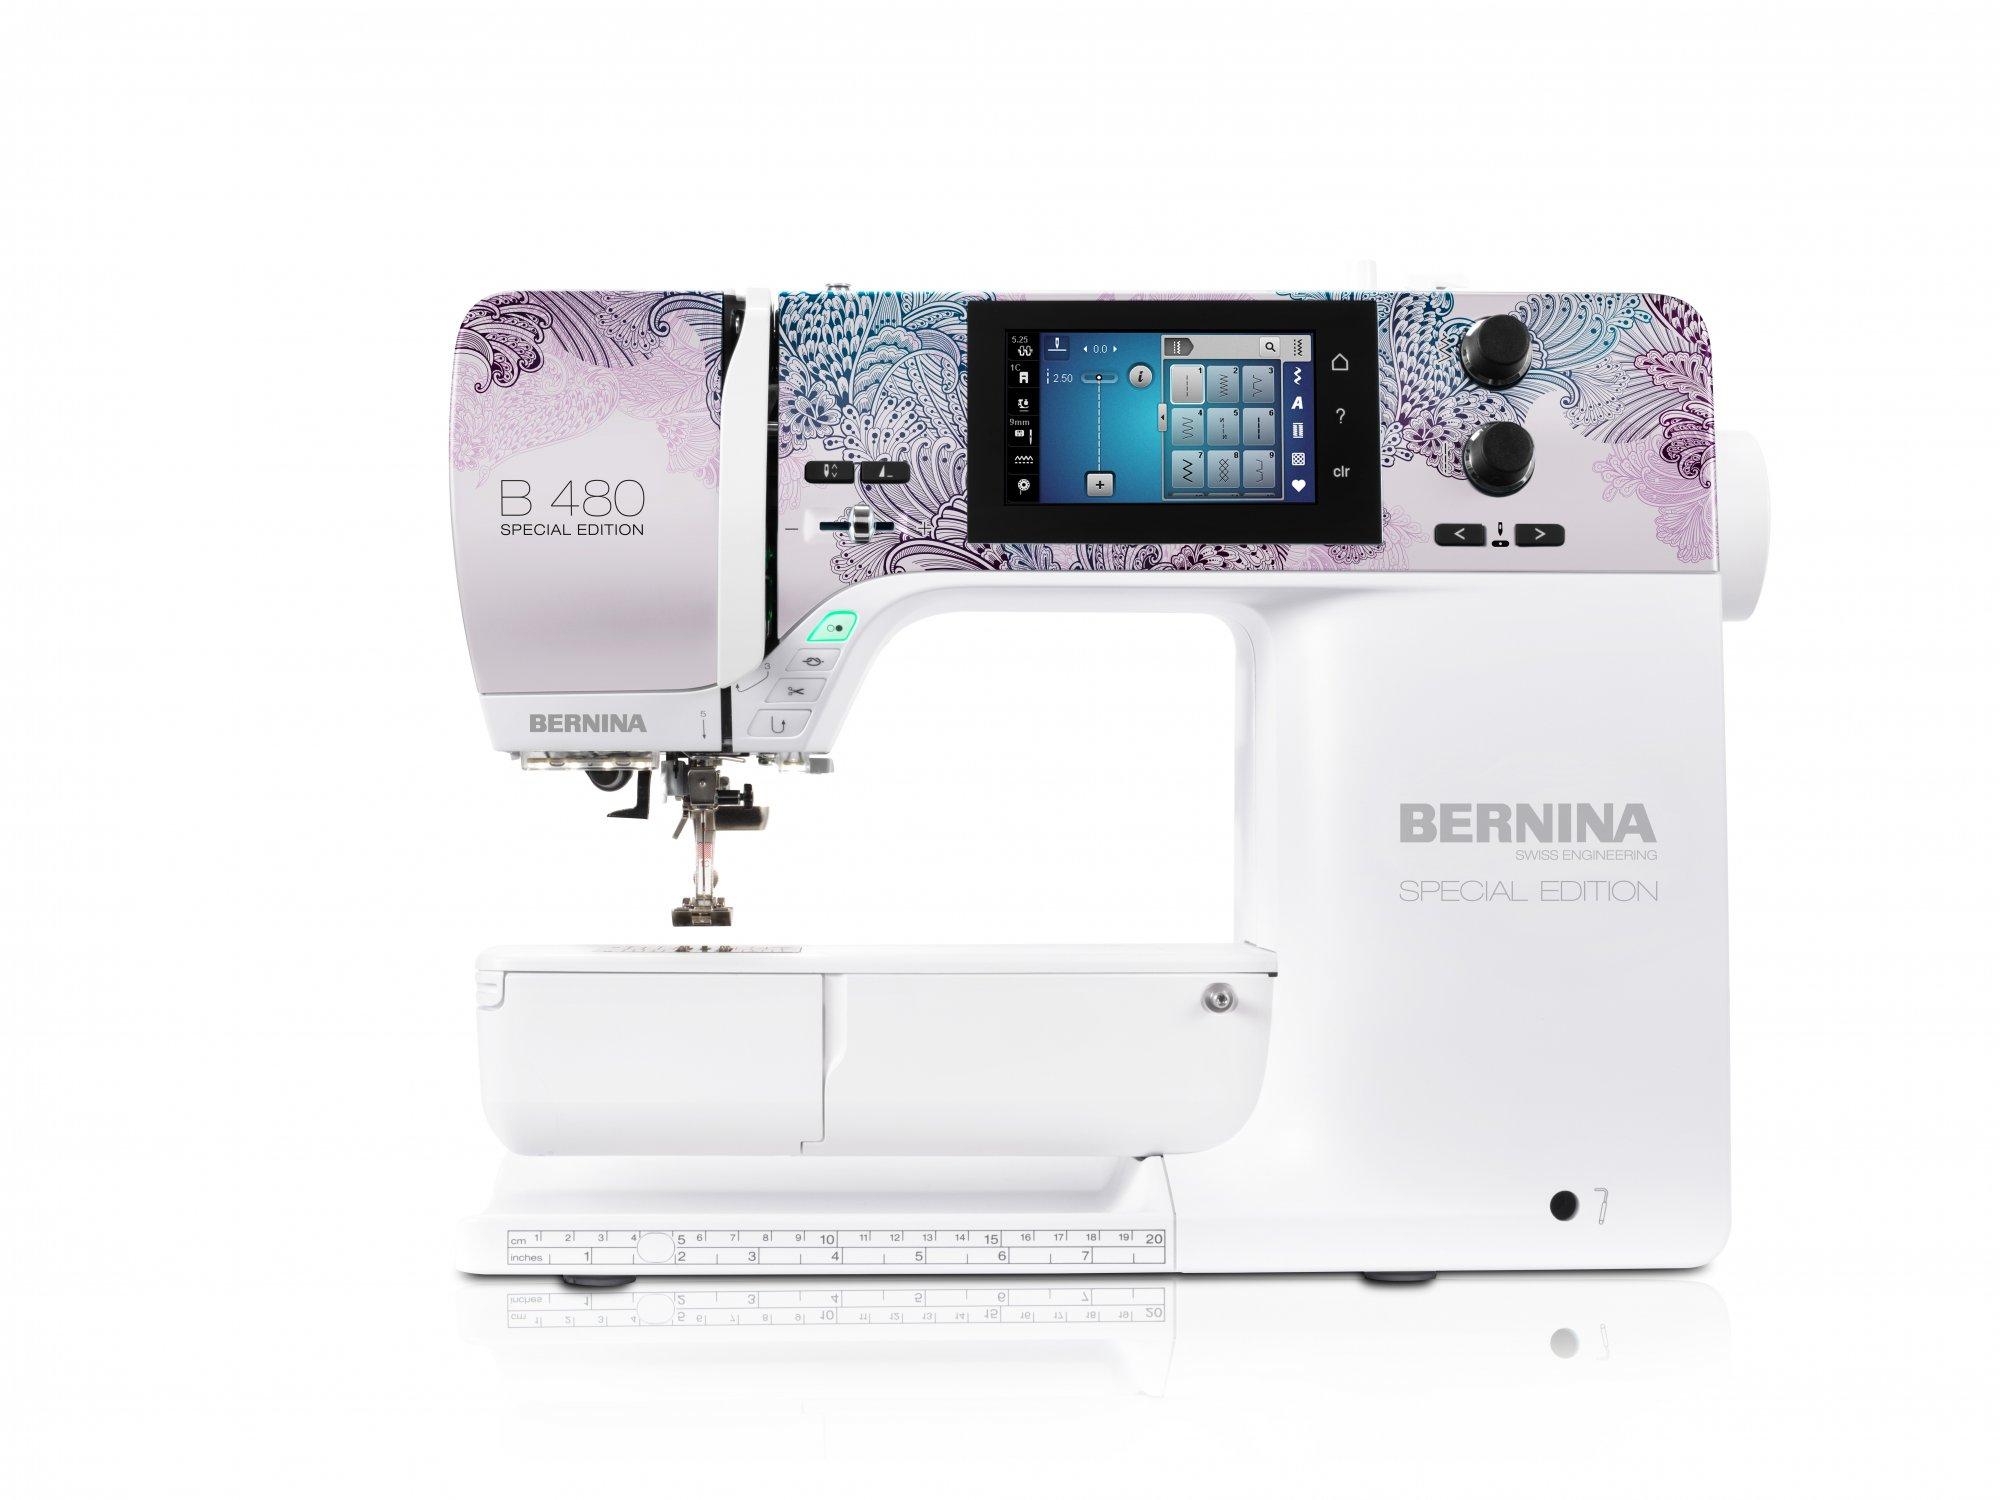 Bernina B480 Special Edition